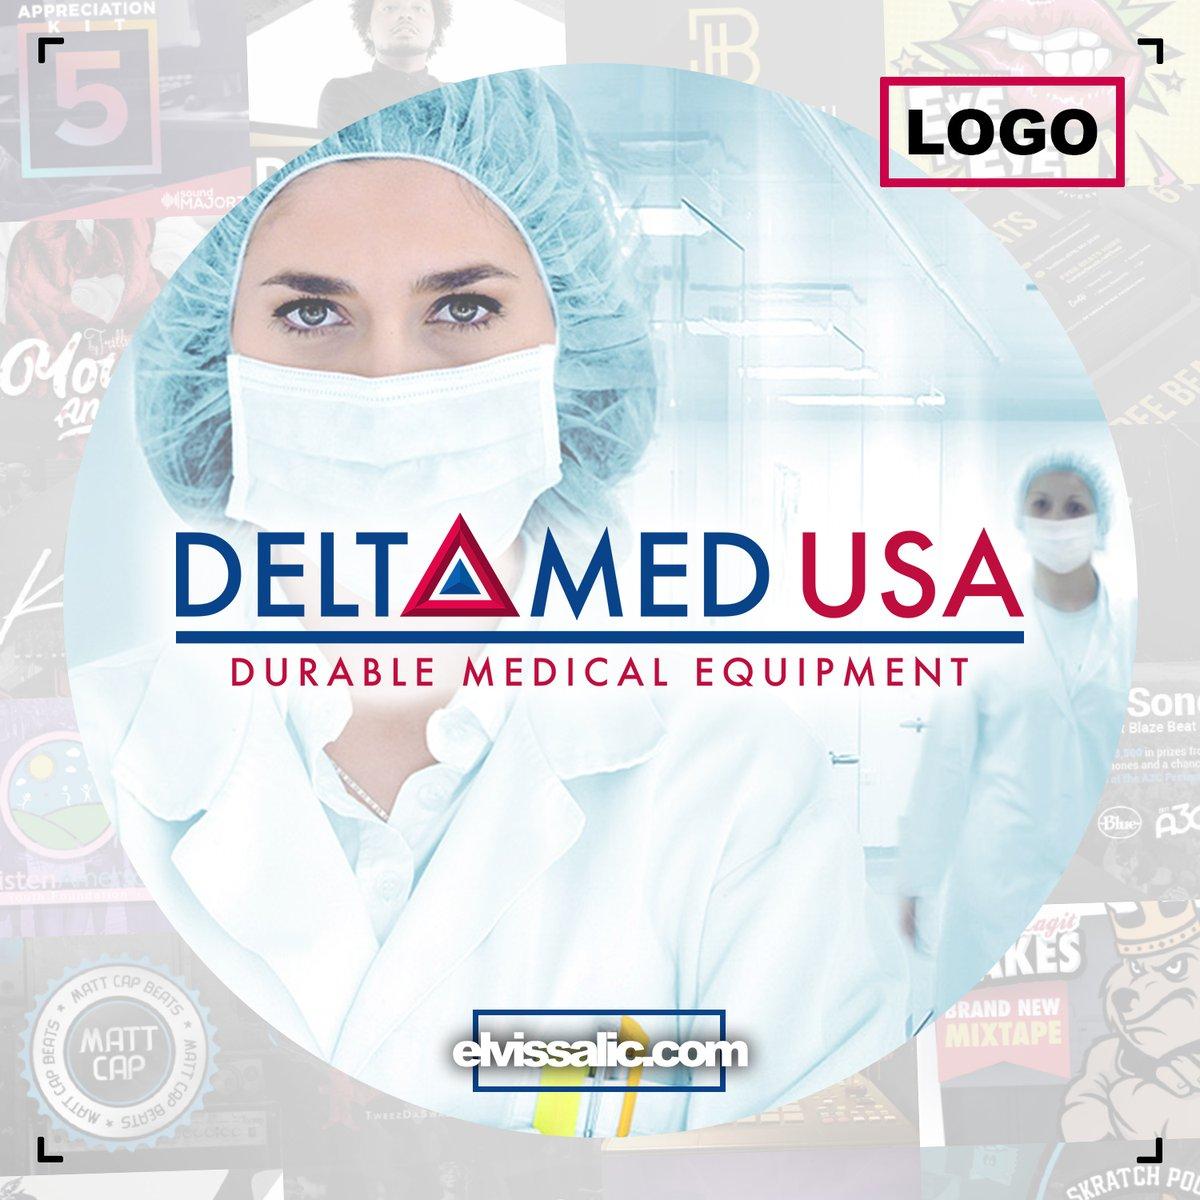 DeltaMed USA logo development  #graphic #design #graphicdesign #illustrator #vectordesign #brandingdesign #logoinspiration #logodesigner #logocreation #photoshop #illustratordesign #designoftheday #businesslogo #medicallogo #identitydesign #medicalbusiness #medlogo https://t.co/kap2wSu5Wj